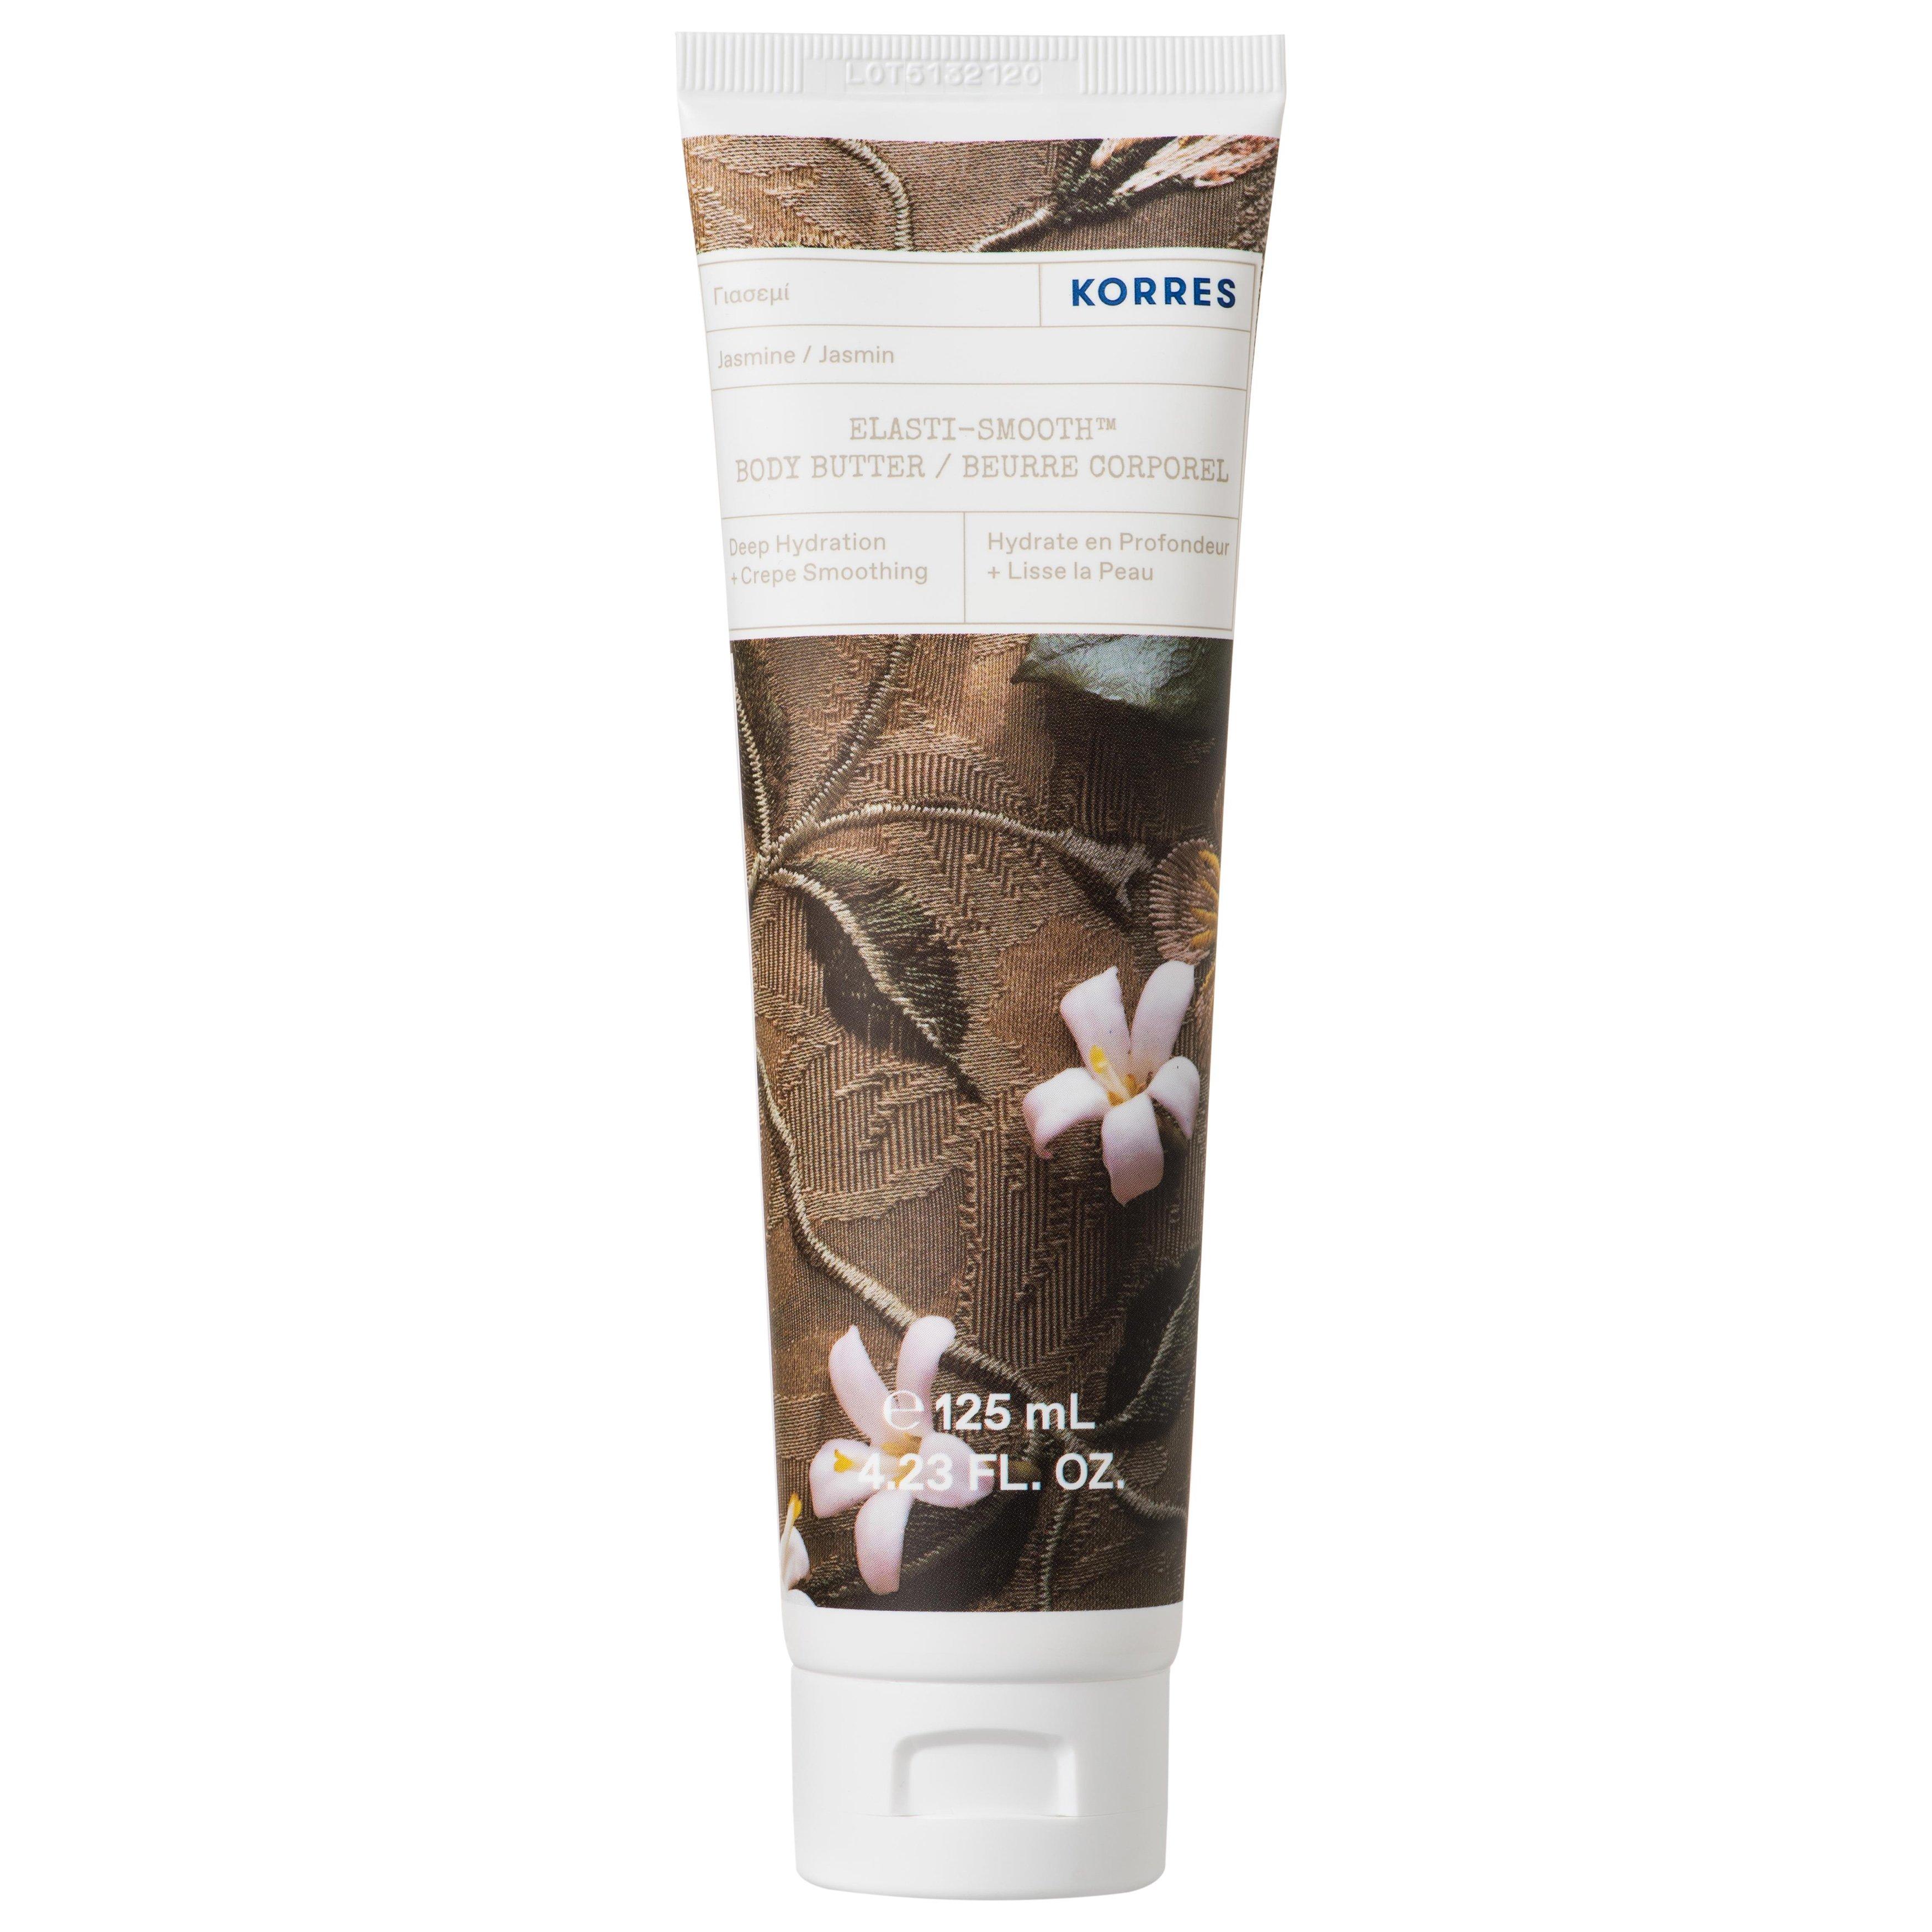 Korres Jasmine Elasti-Smooth Body Butter Πλούσιο Κρεμώδες Γαλάκτωμα Σώματος με Φρέσκο Άρωμα Γιασεμί 125ml